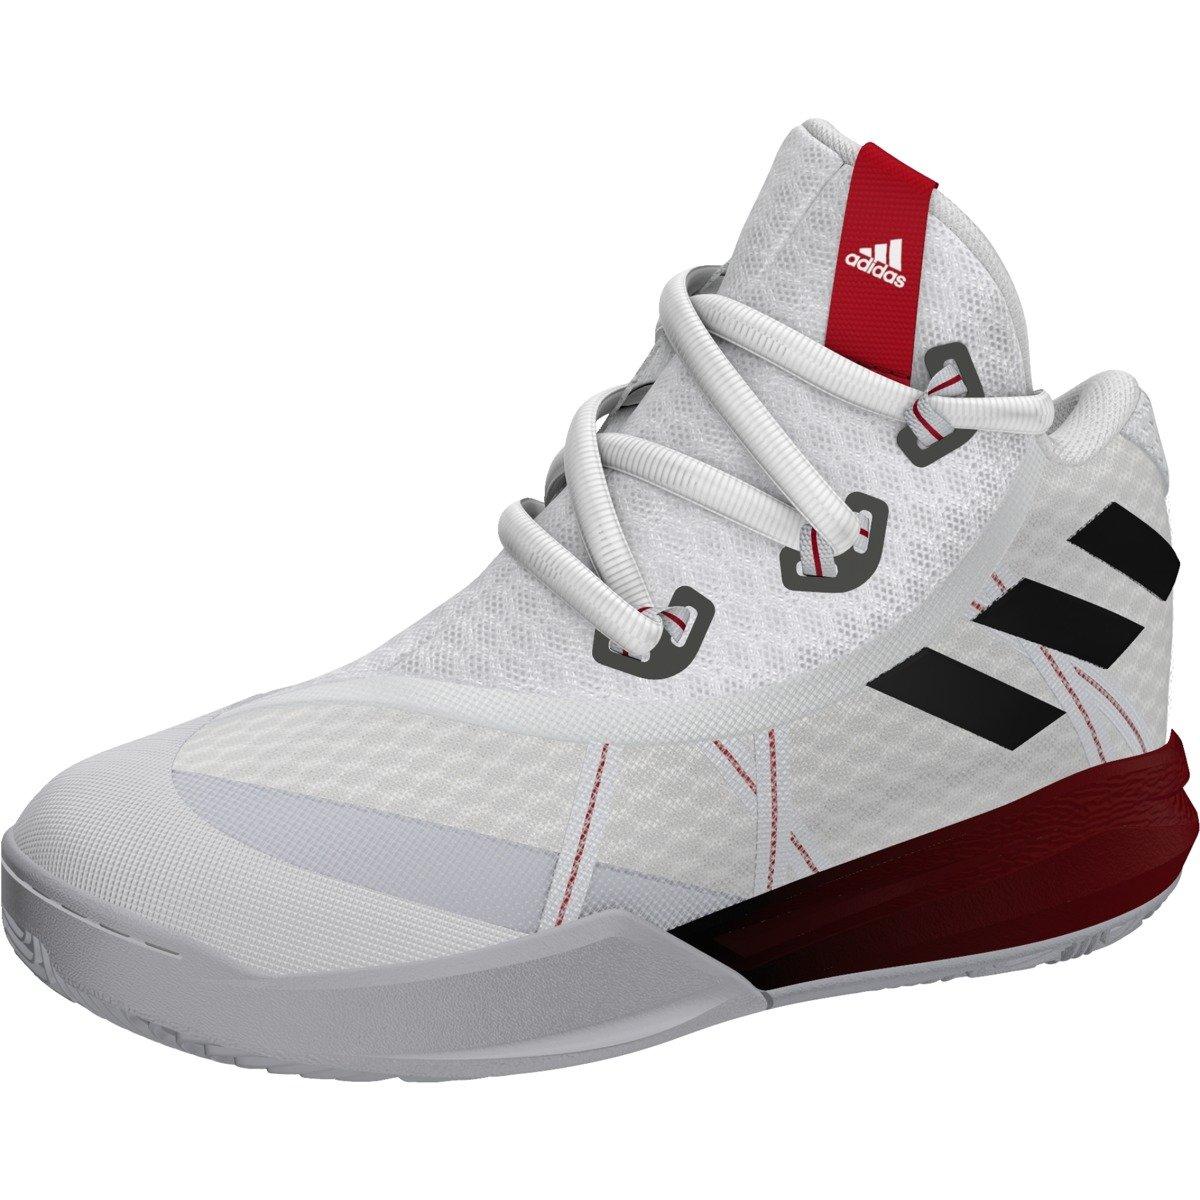 Adidas Bounce Basketball Shoes Price